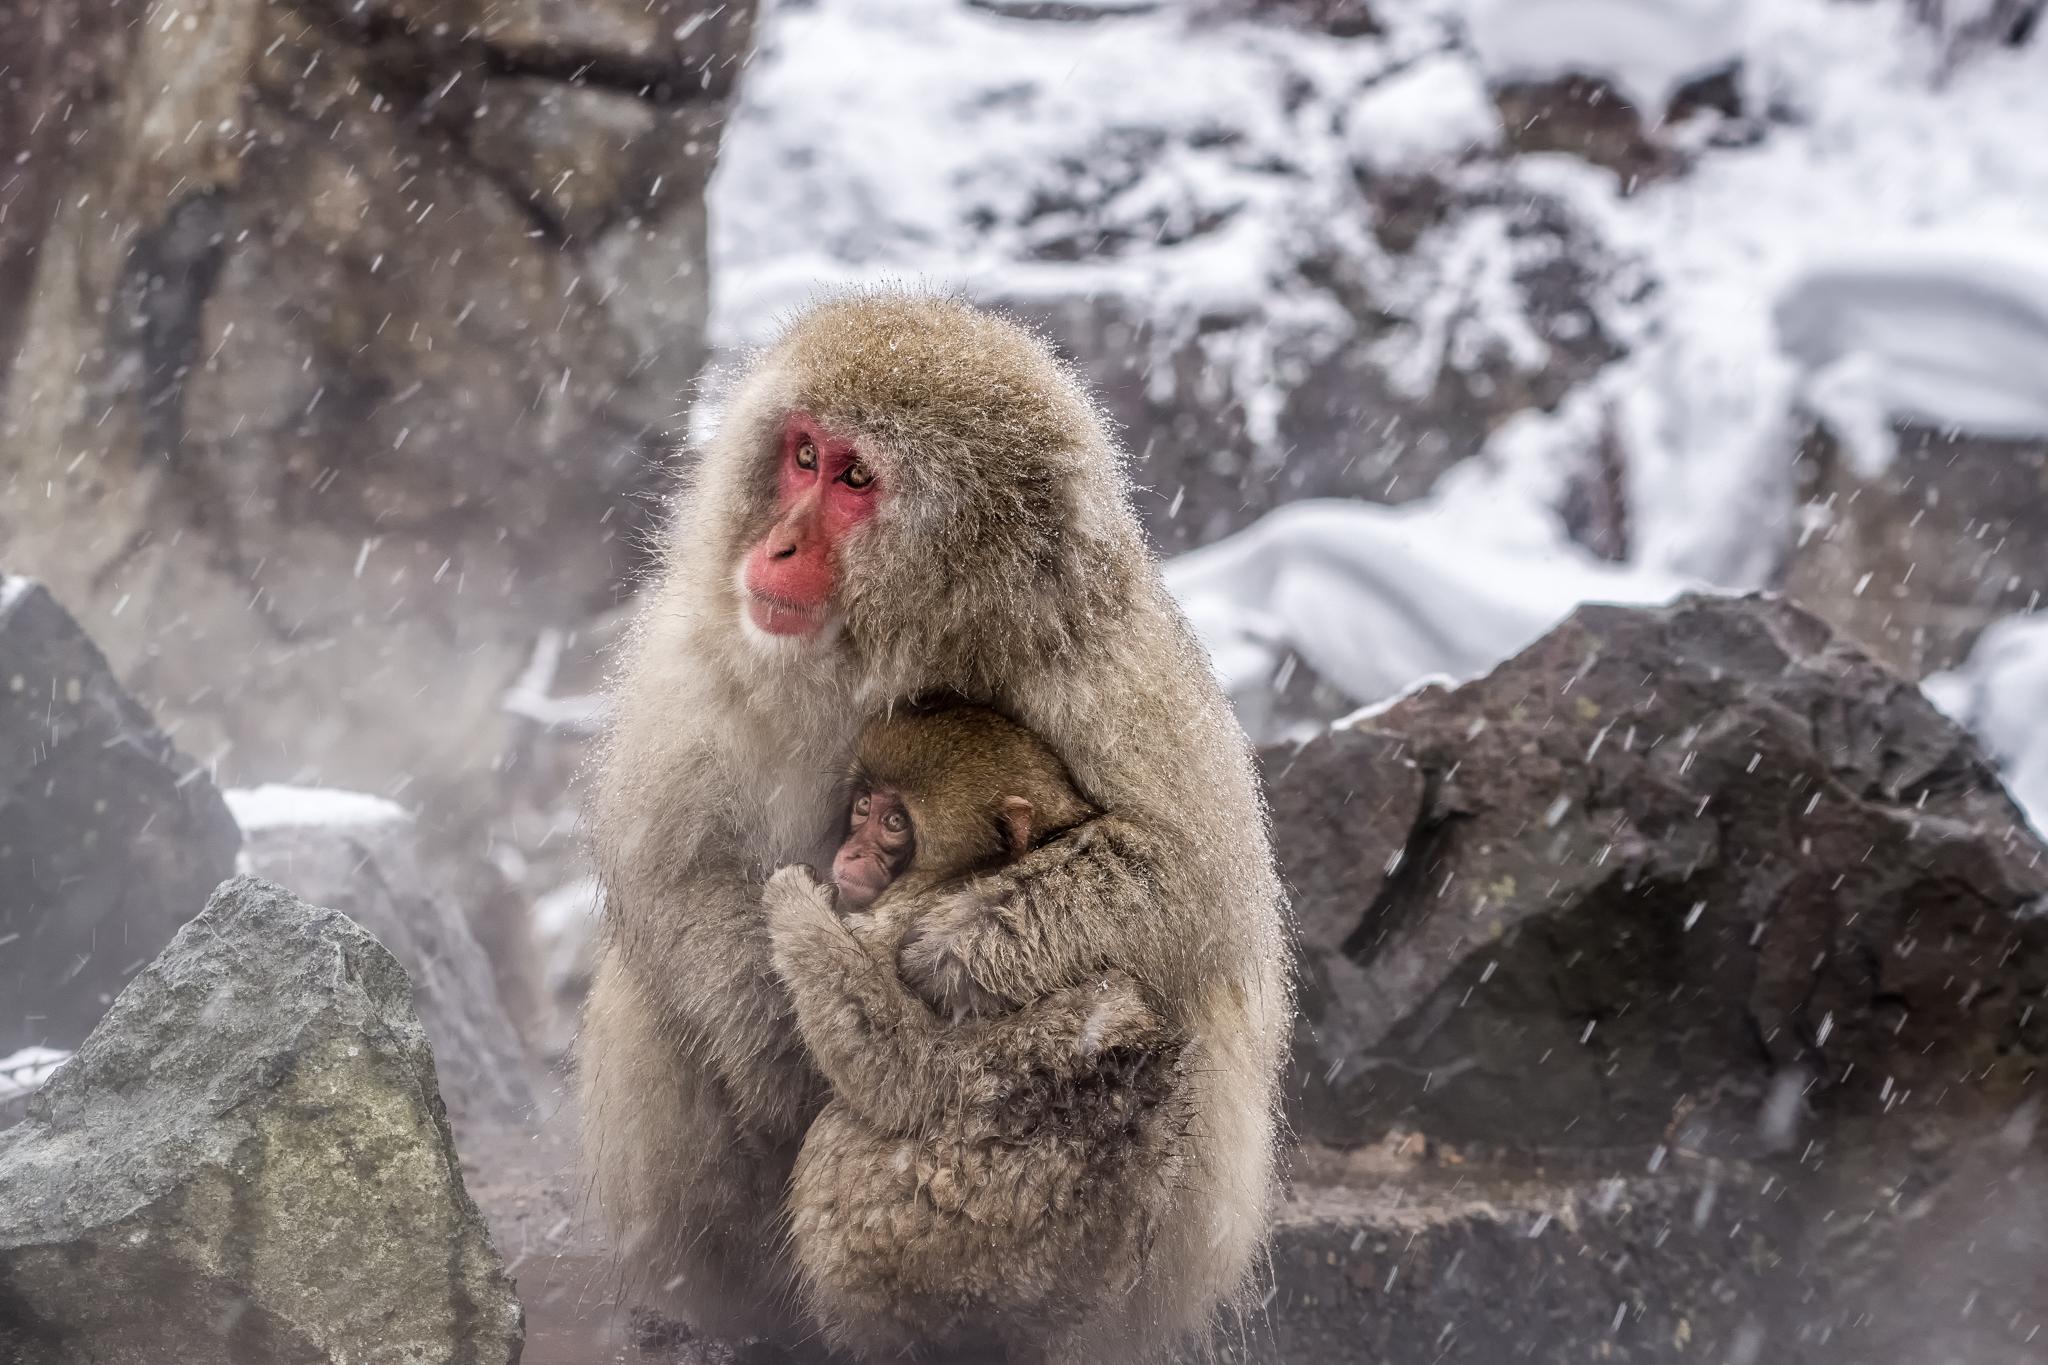 Snow Monkeys in the hills of Jigokunda